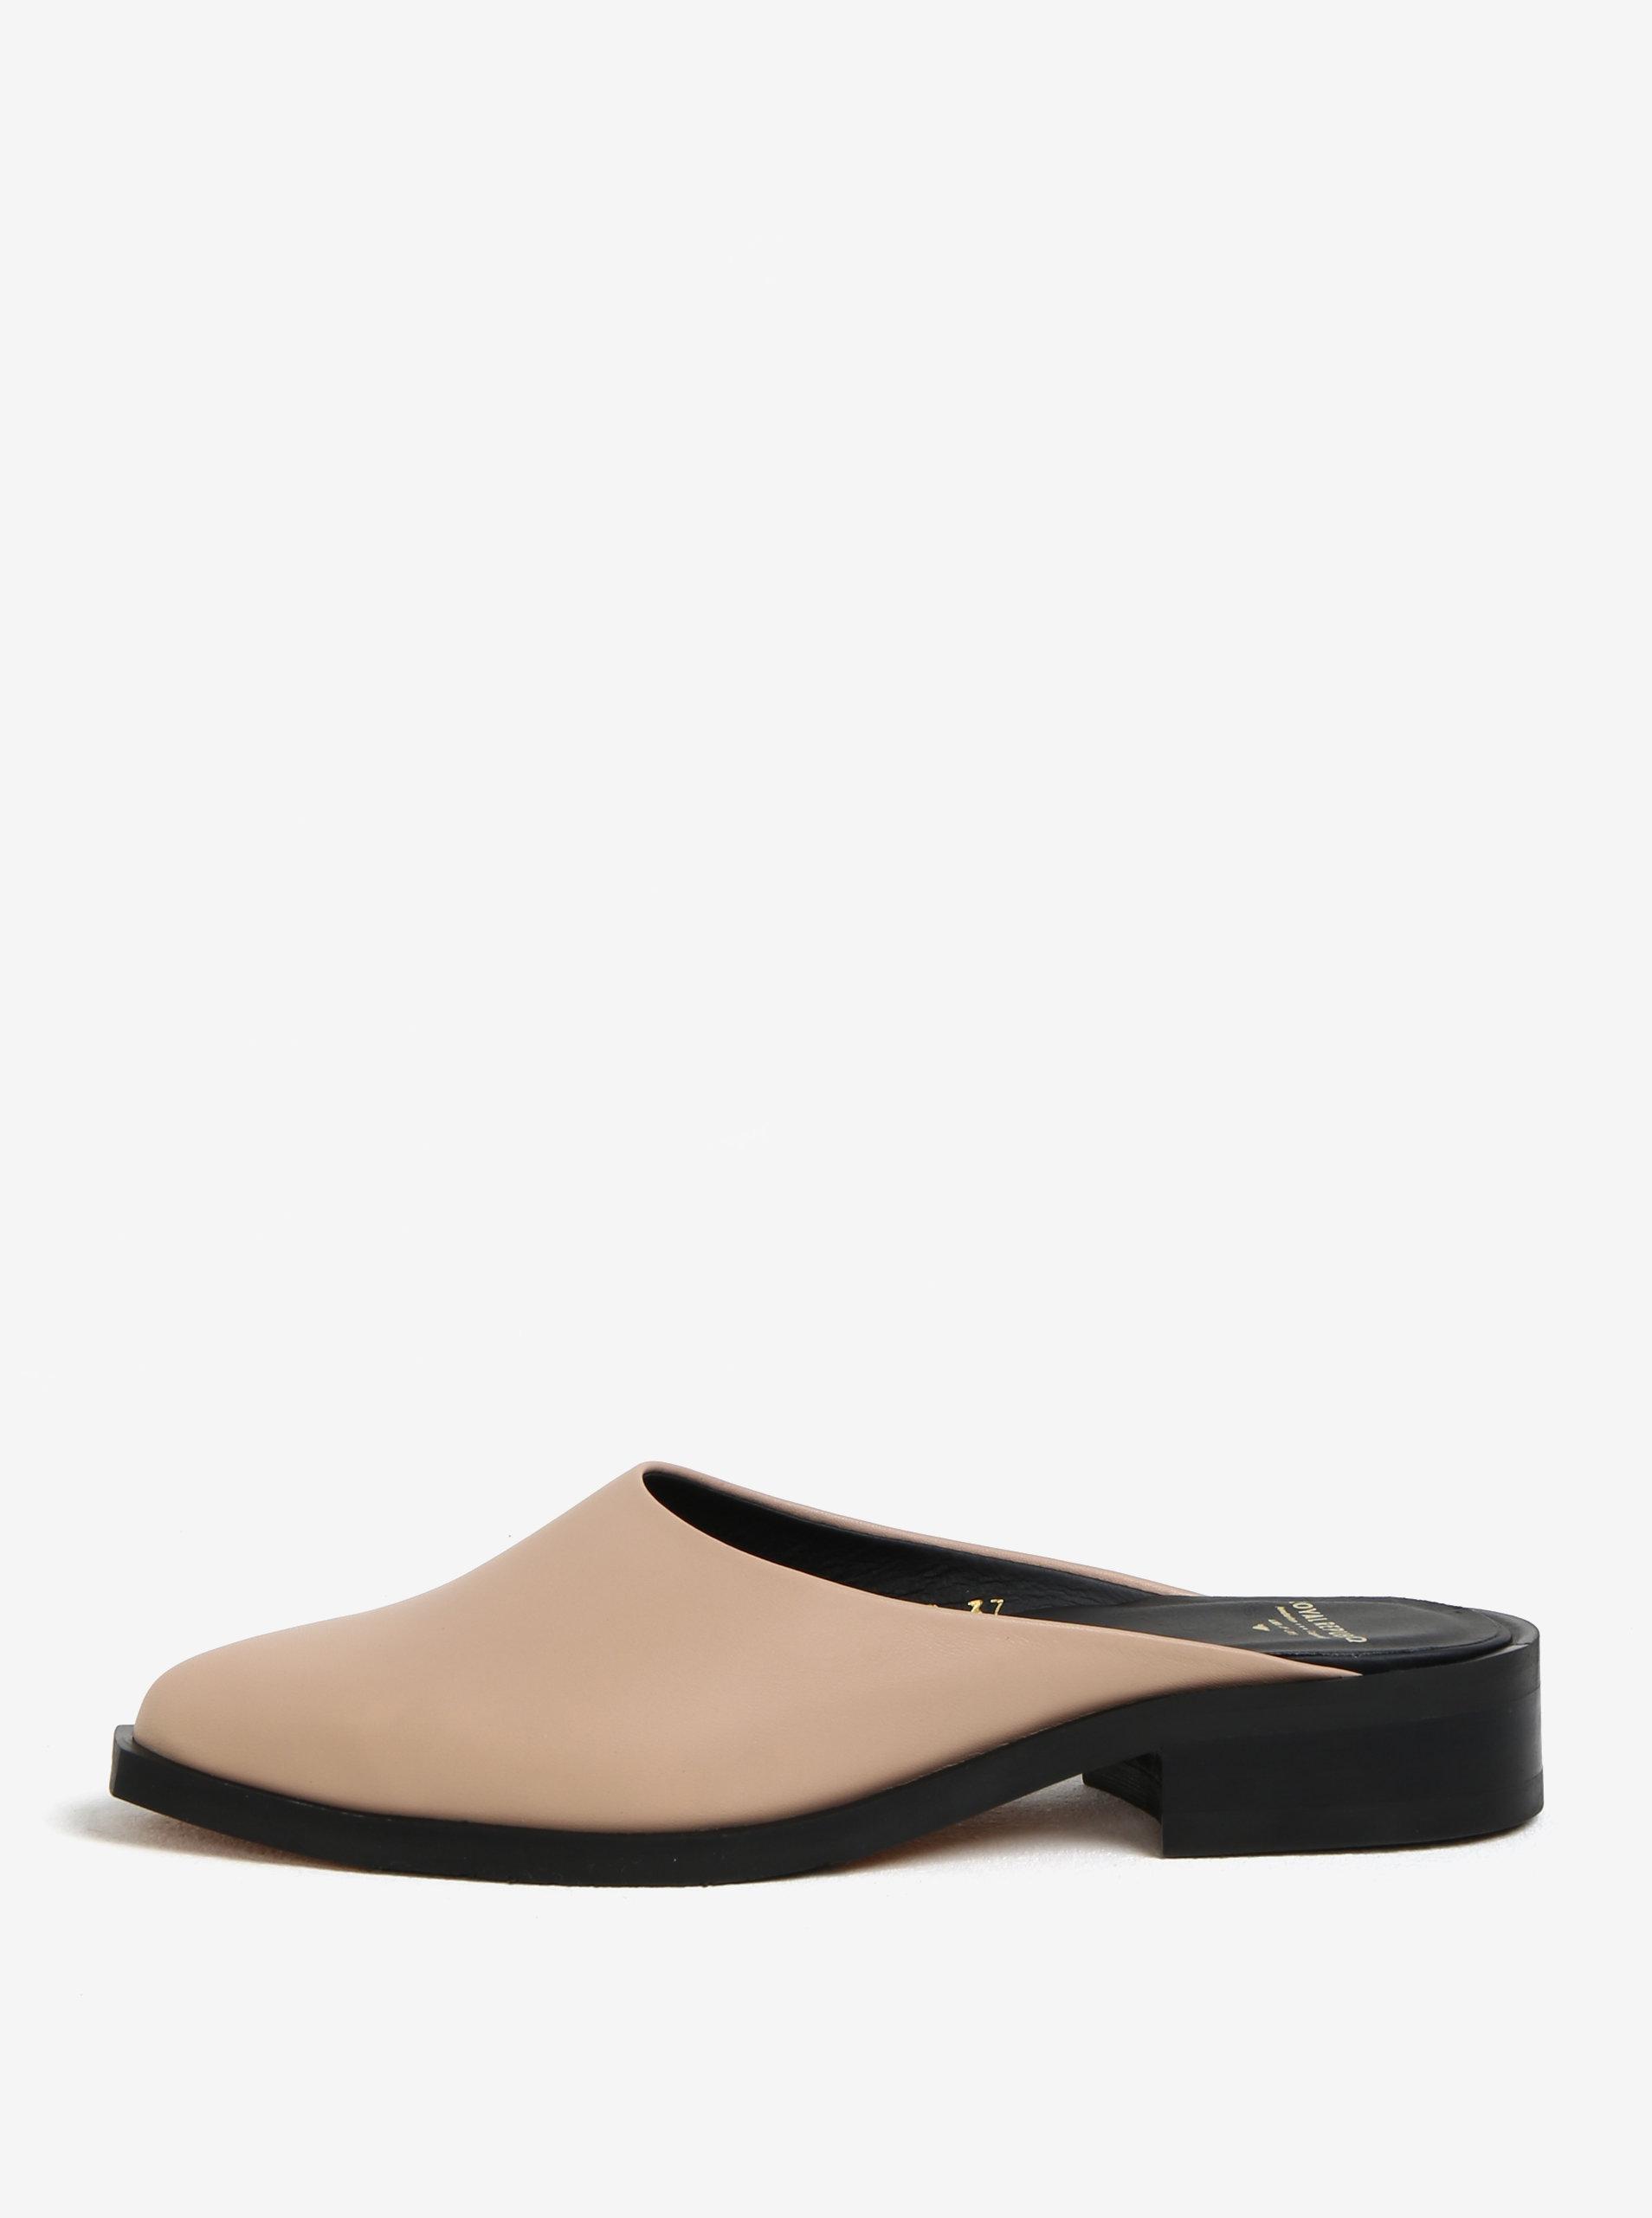 230e0cabf7d Béžové dámské kožené pantofle Royal RepubliQ ...